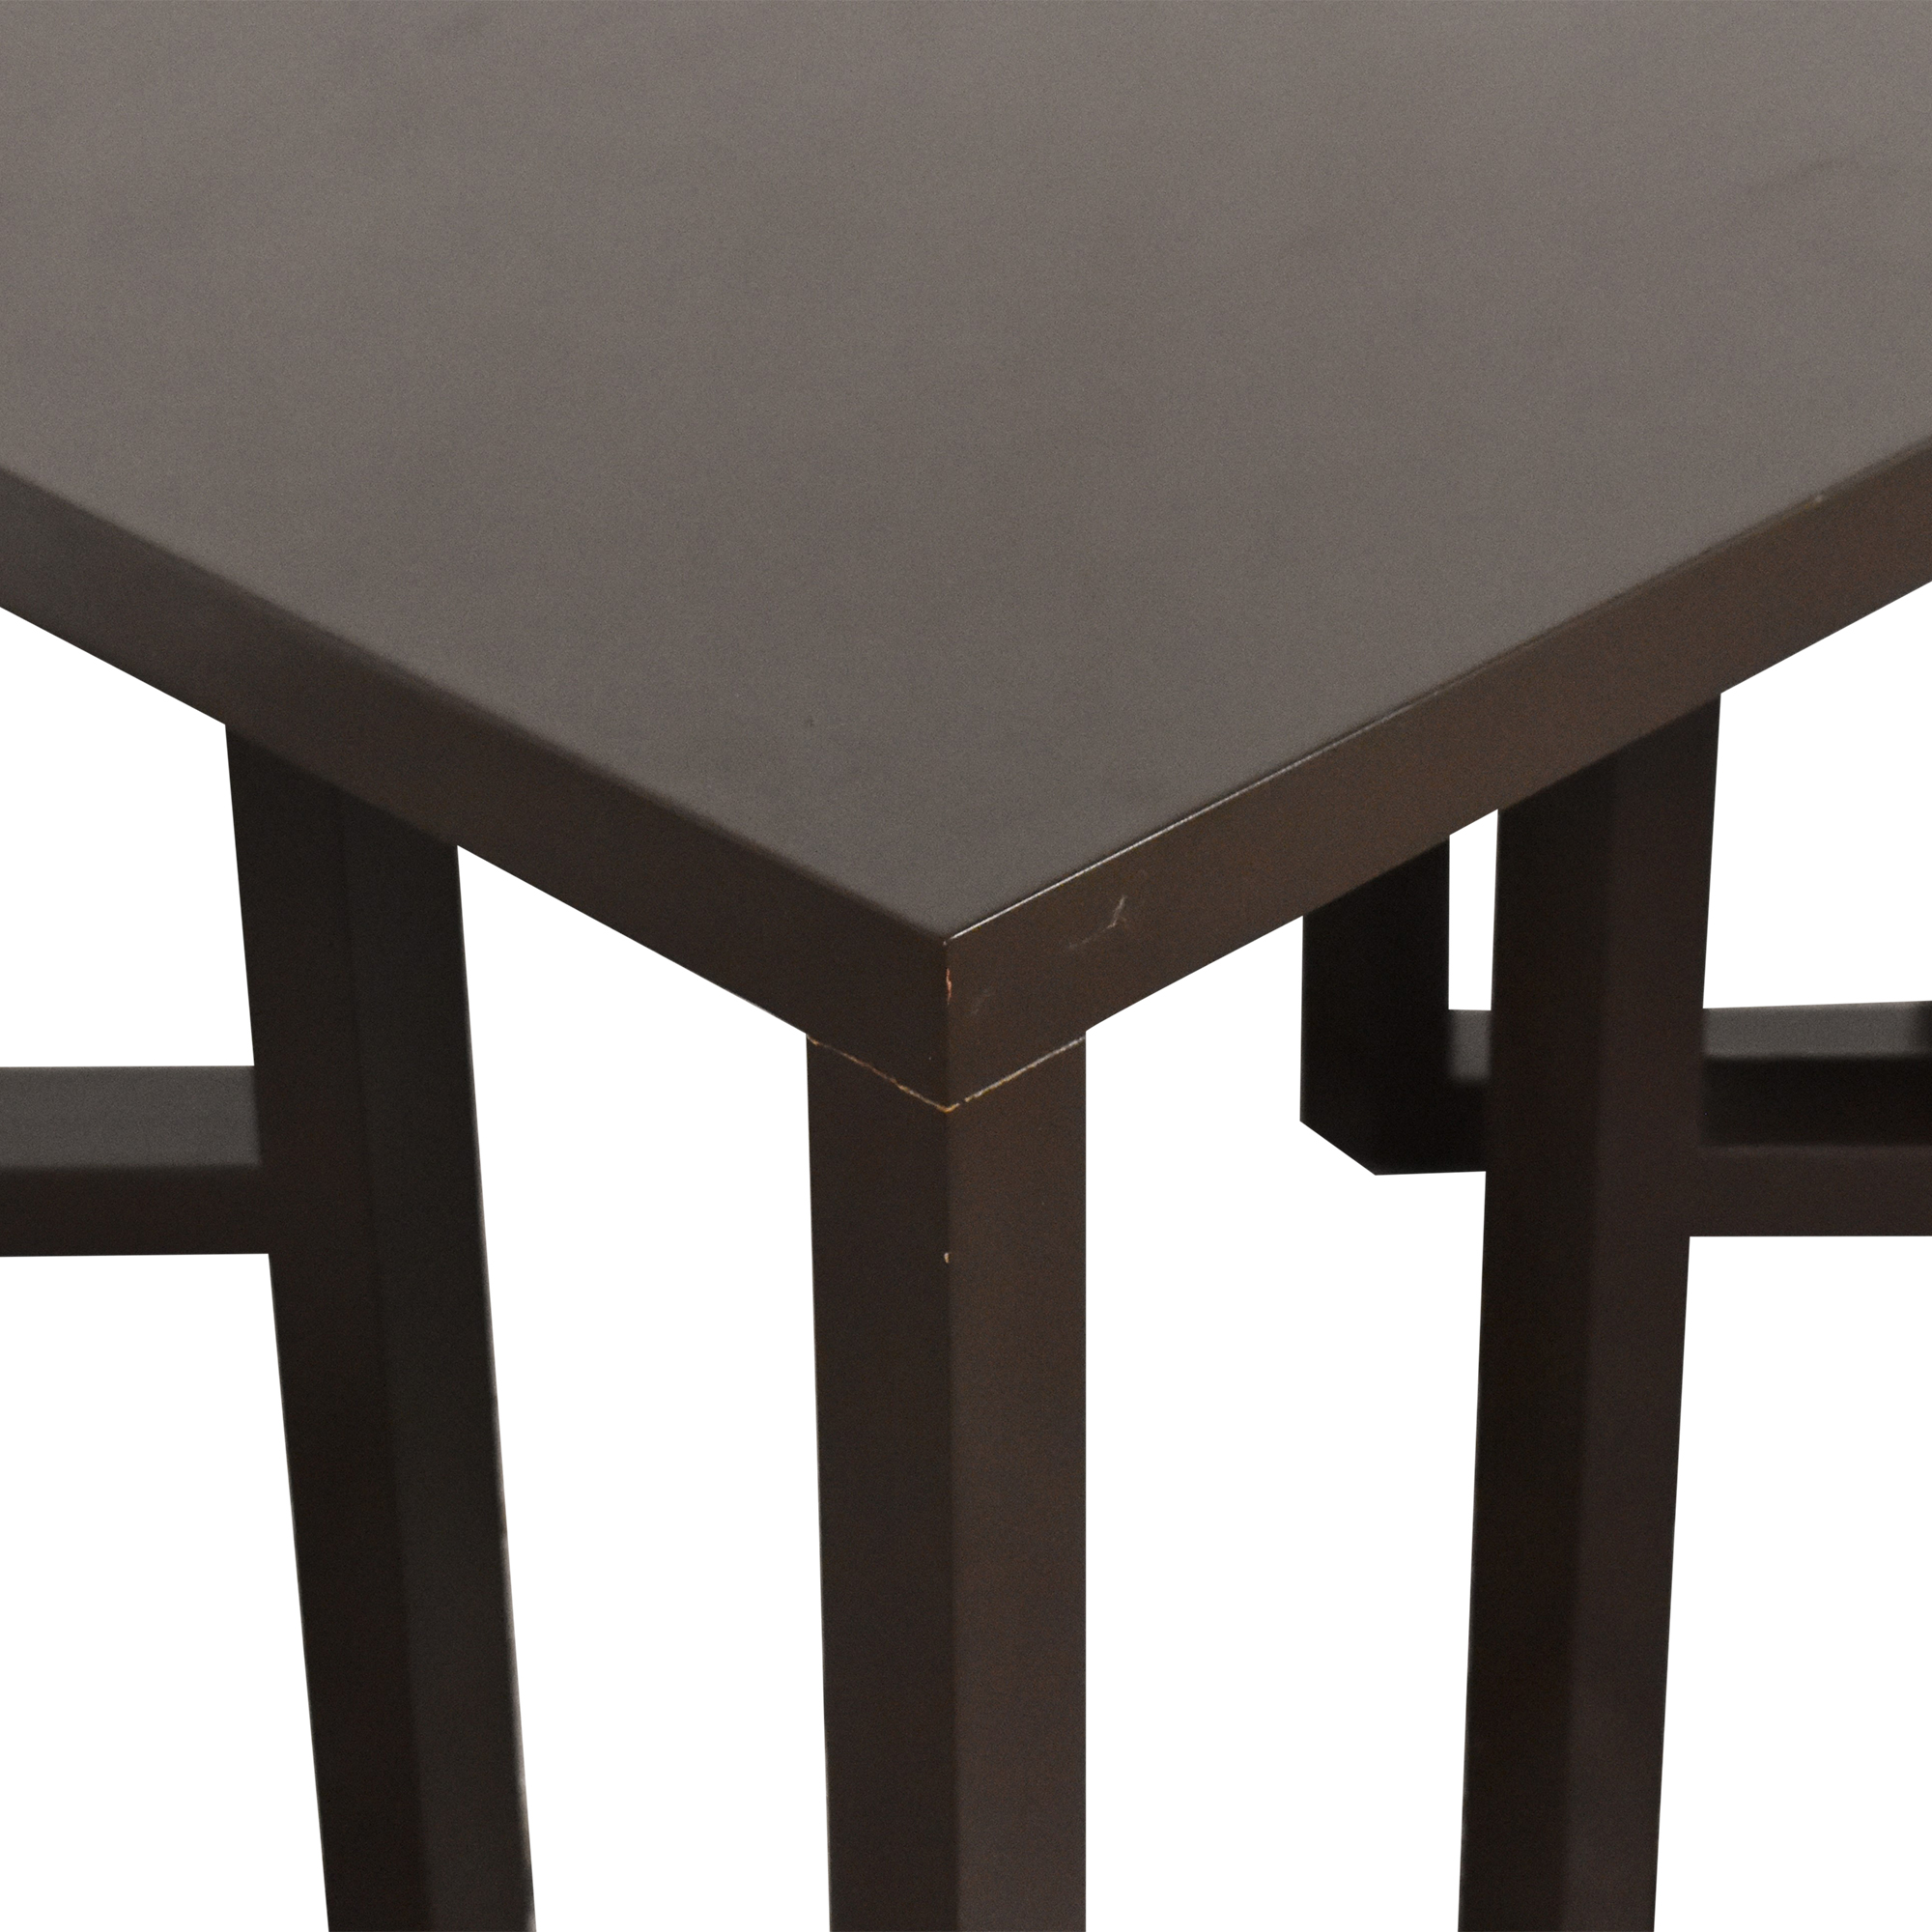 Bungalow 5 Bungalow 5 Modern Side Tables dark brown